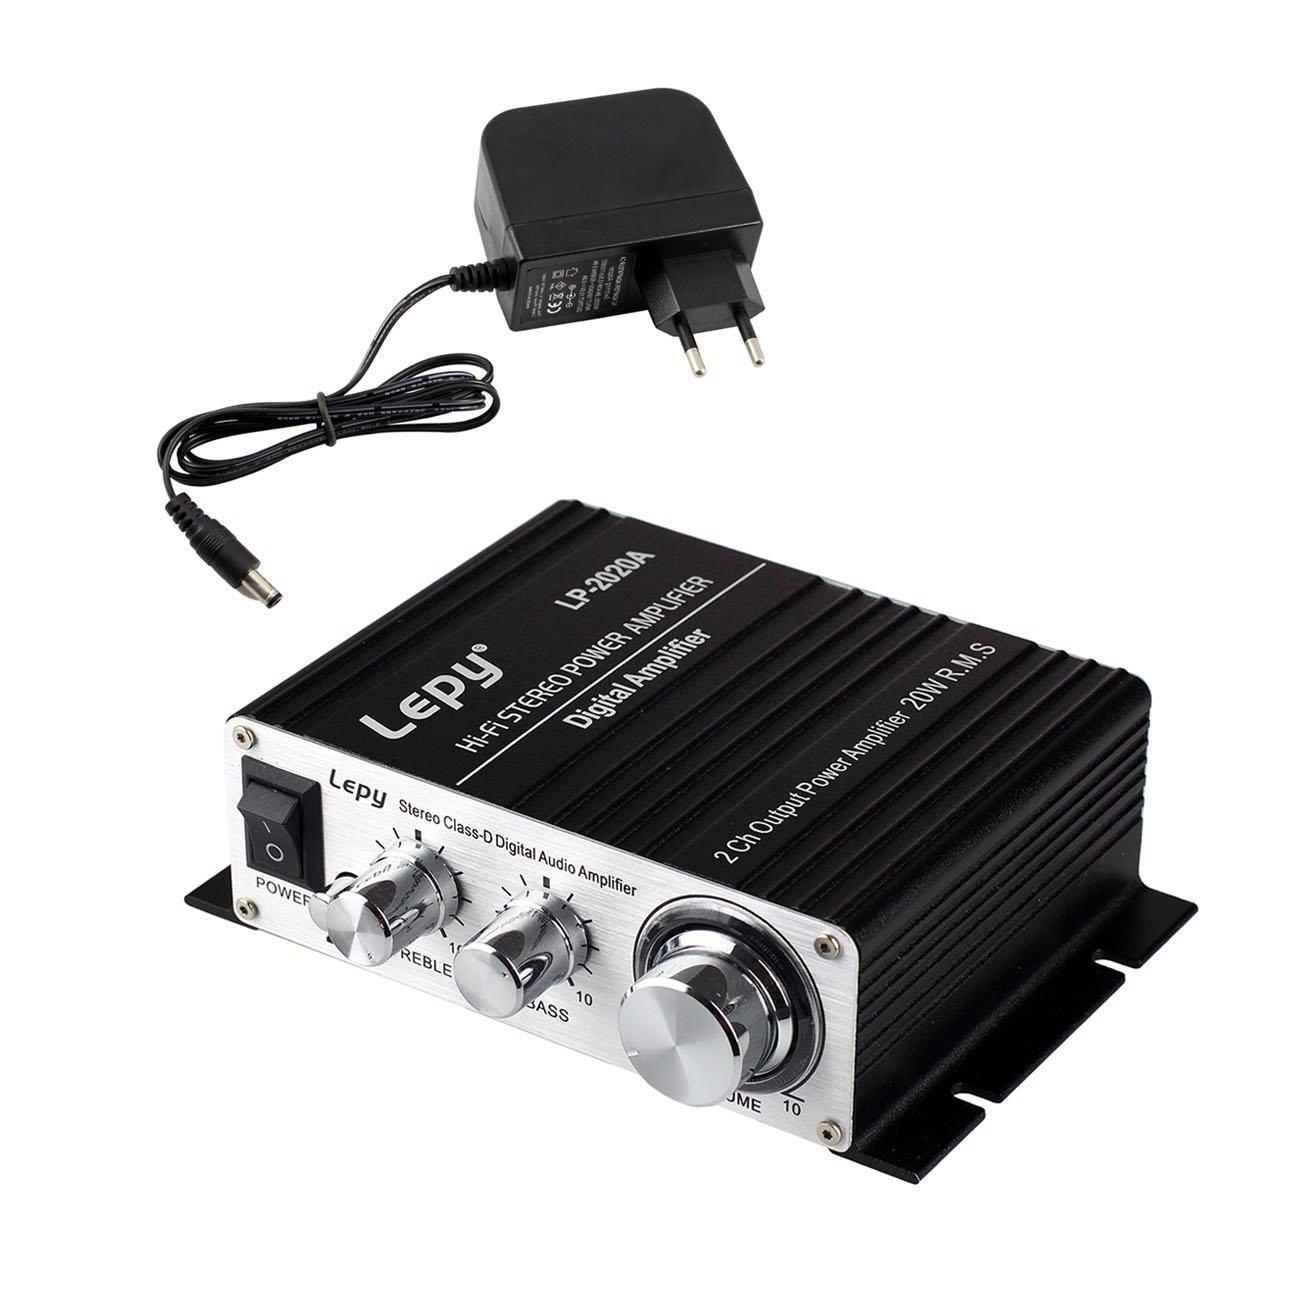 LEPY LP-2020A HIFI (2 x 20W) Amplificador Audio para MP3 MP4 Amplificador Estereo para Telefono Ordenador DAC Fuente de Alimentacion de CA Adaptador de Cargador DC - Negro